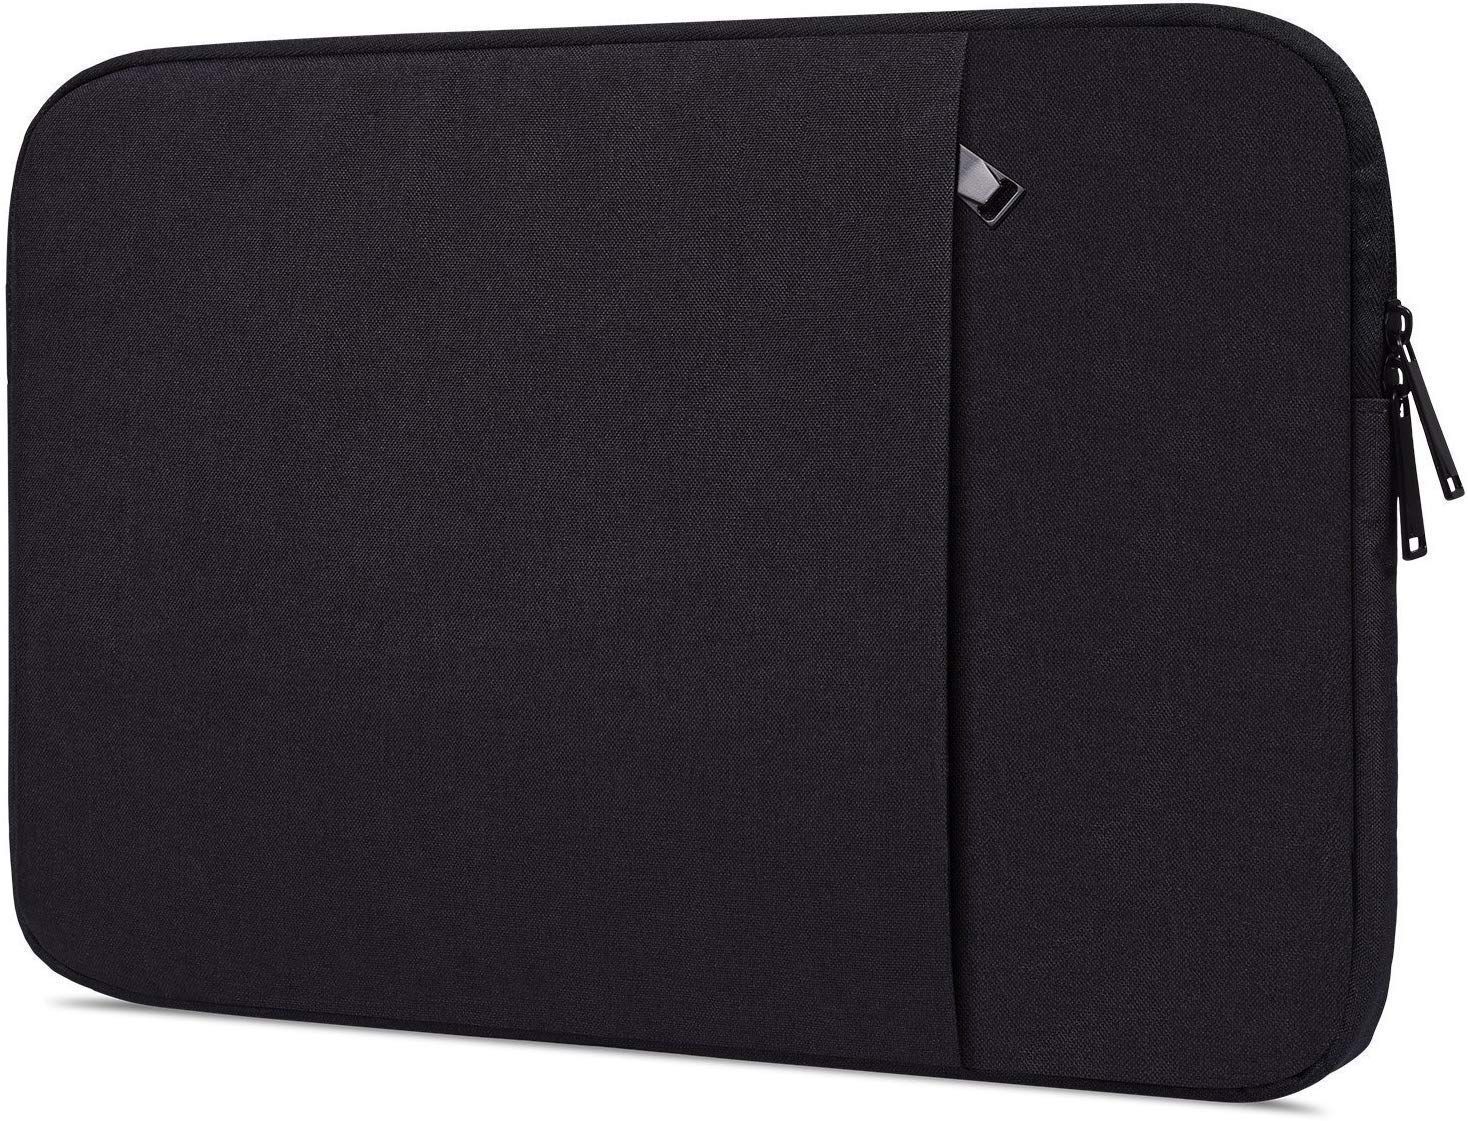 DAMOMCO Laptop Sleeve Bag for 14 Inch Notebook Computer Bag, Black